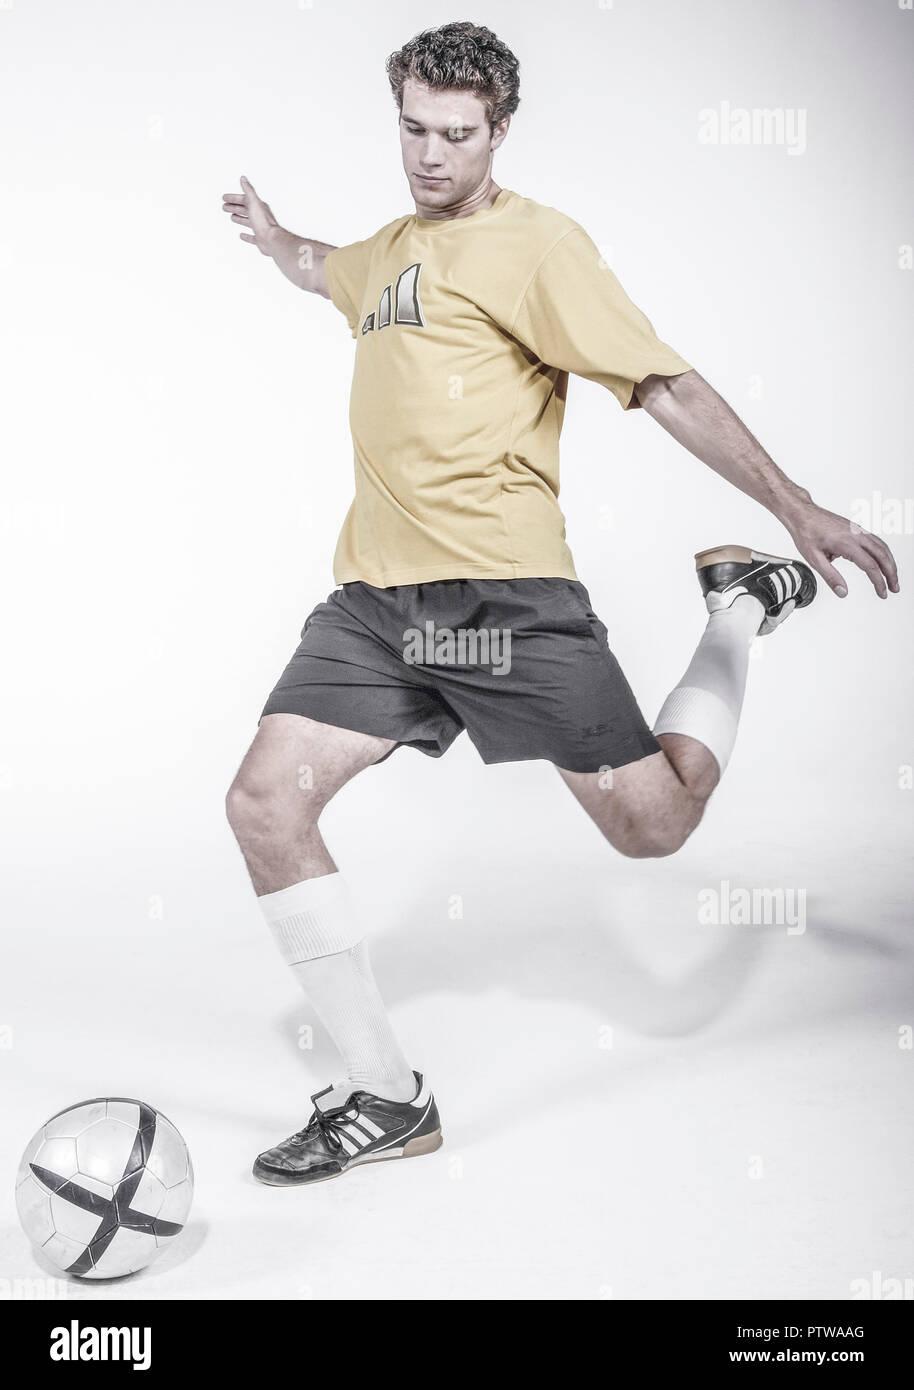 Fussballspieler beim Schuss (model-released) - Stock Image